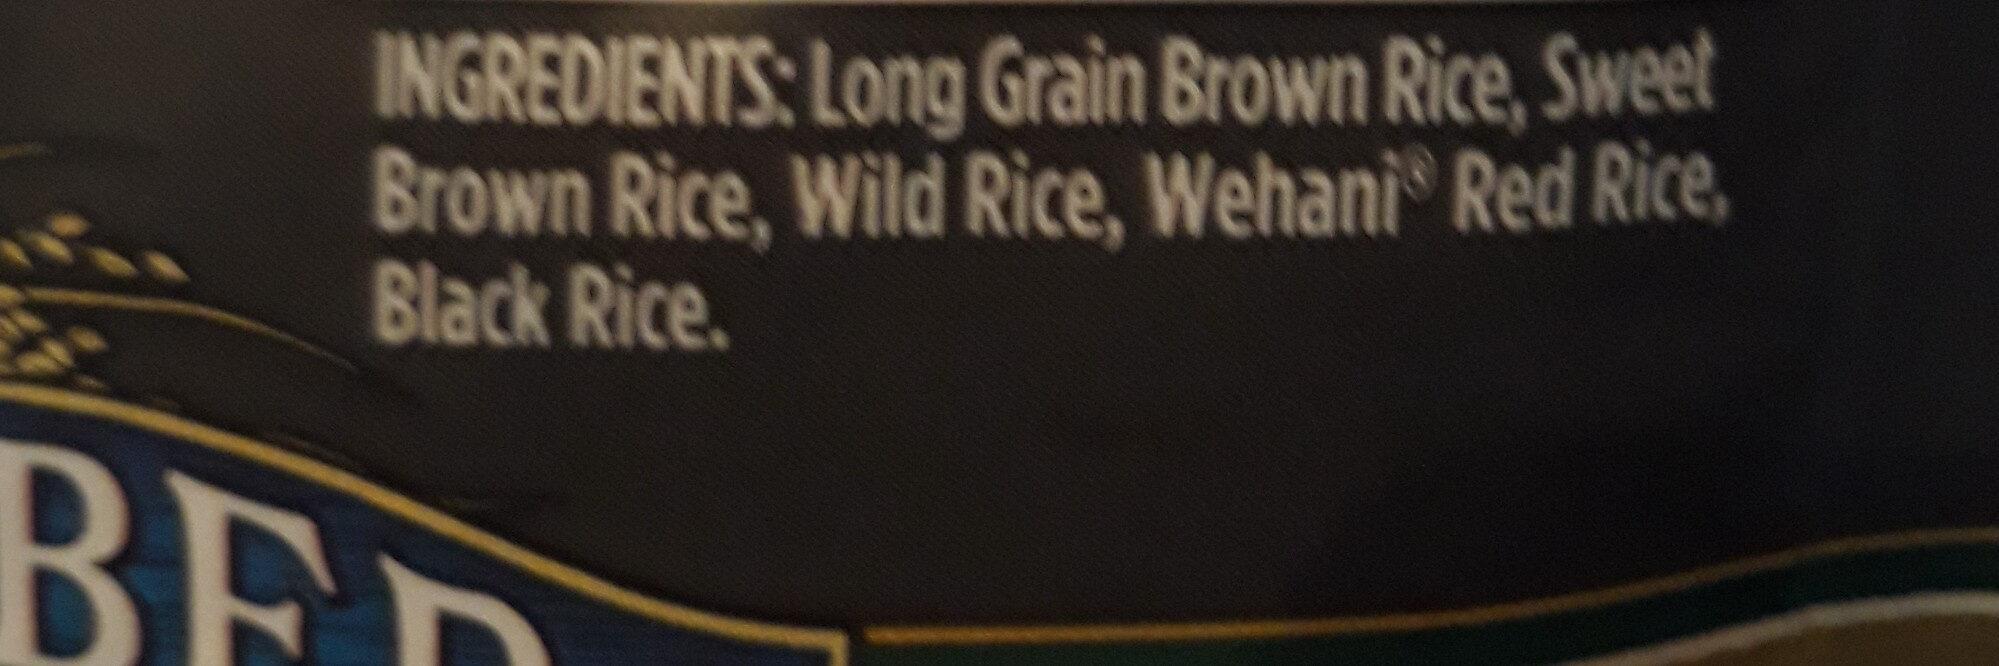 Wild Blend Rice - Ingredients